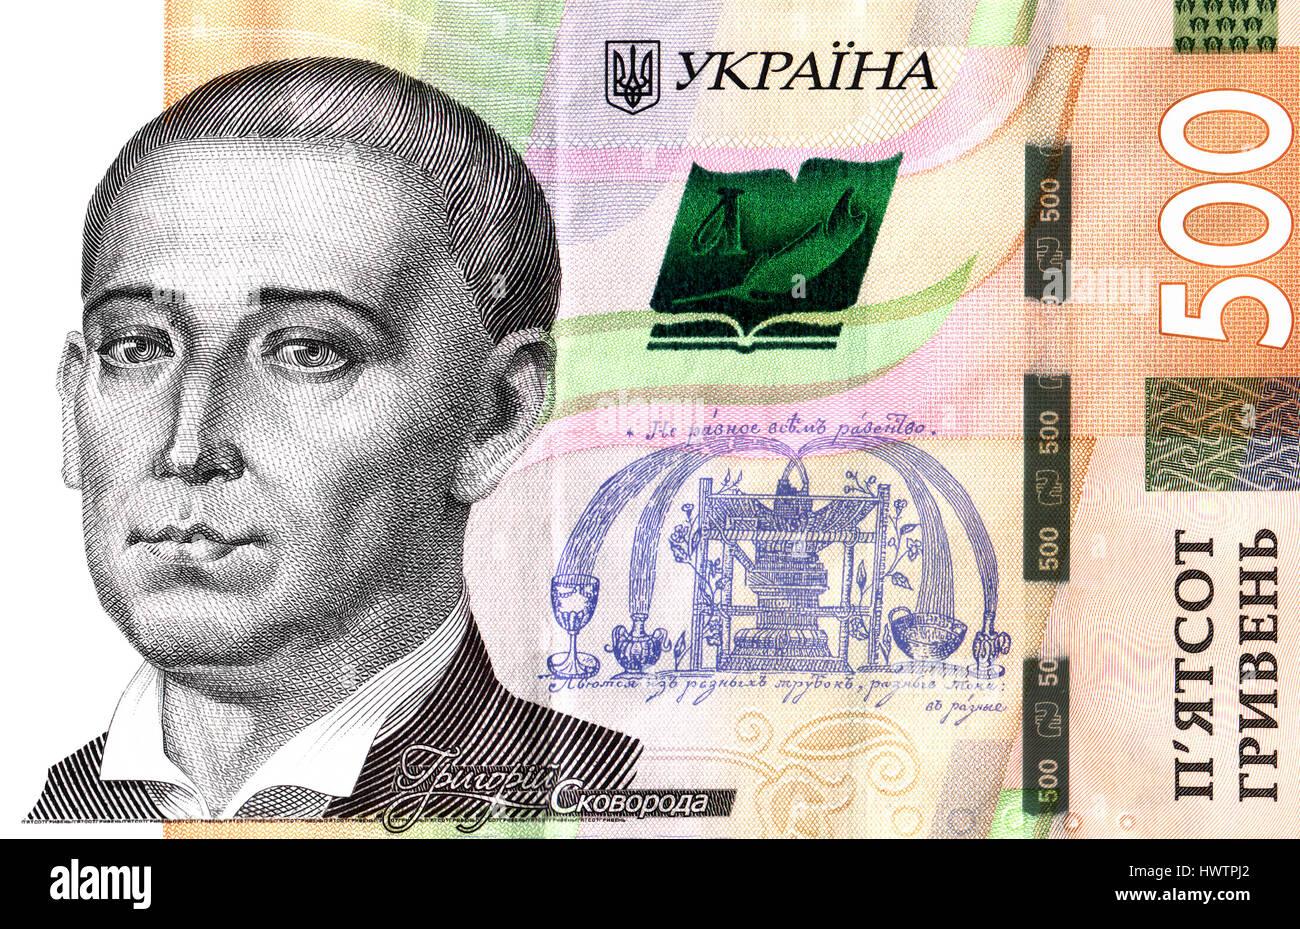 Portrait of Gregory Skovoroda on the banknote 500 hryvnia in Ukrainian currency - Stock Image